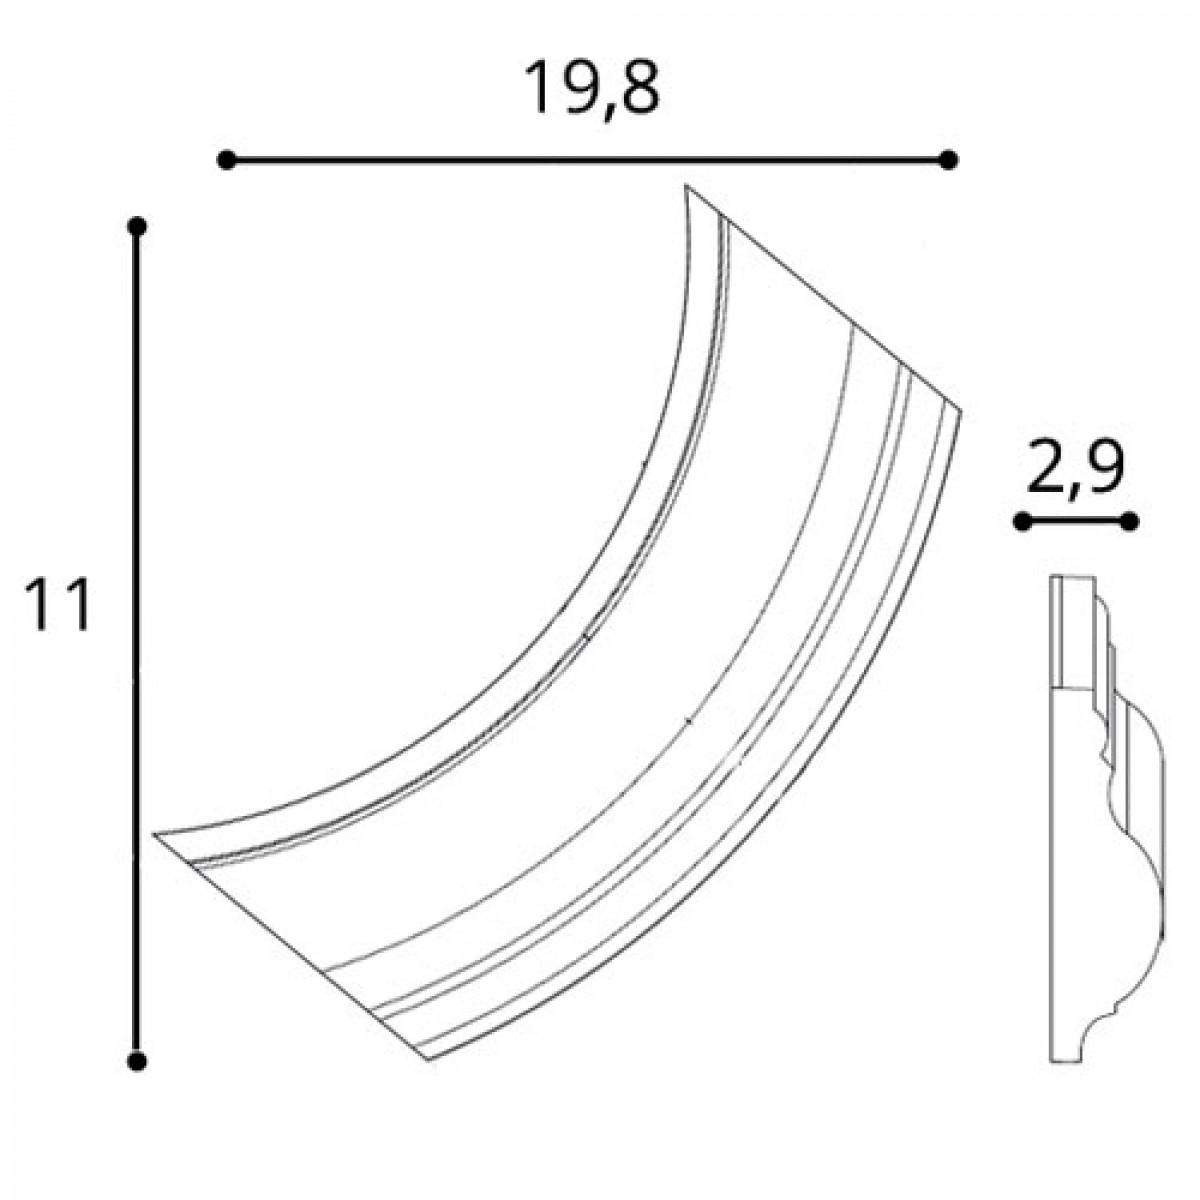 Coltar Pentru P8020 Luxxus P801C, Dimensiuni: 19.8 X 11 X 2.6 cm, Orac Decor